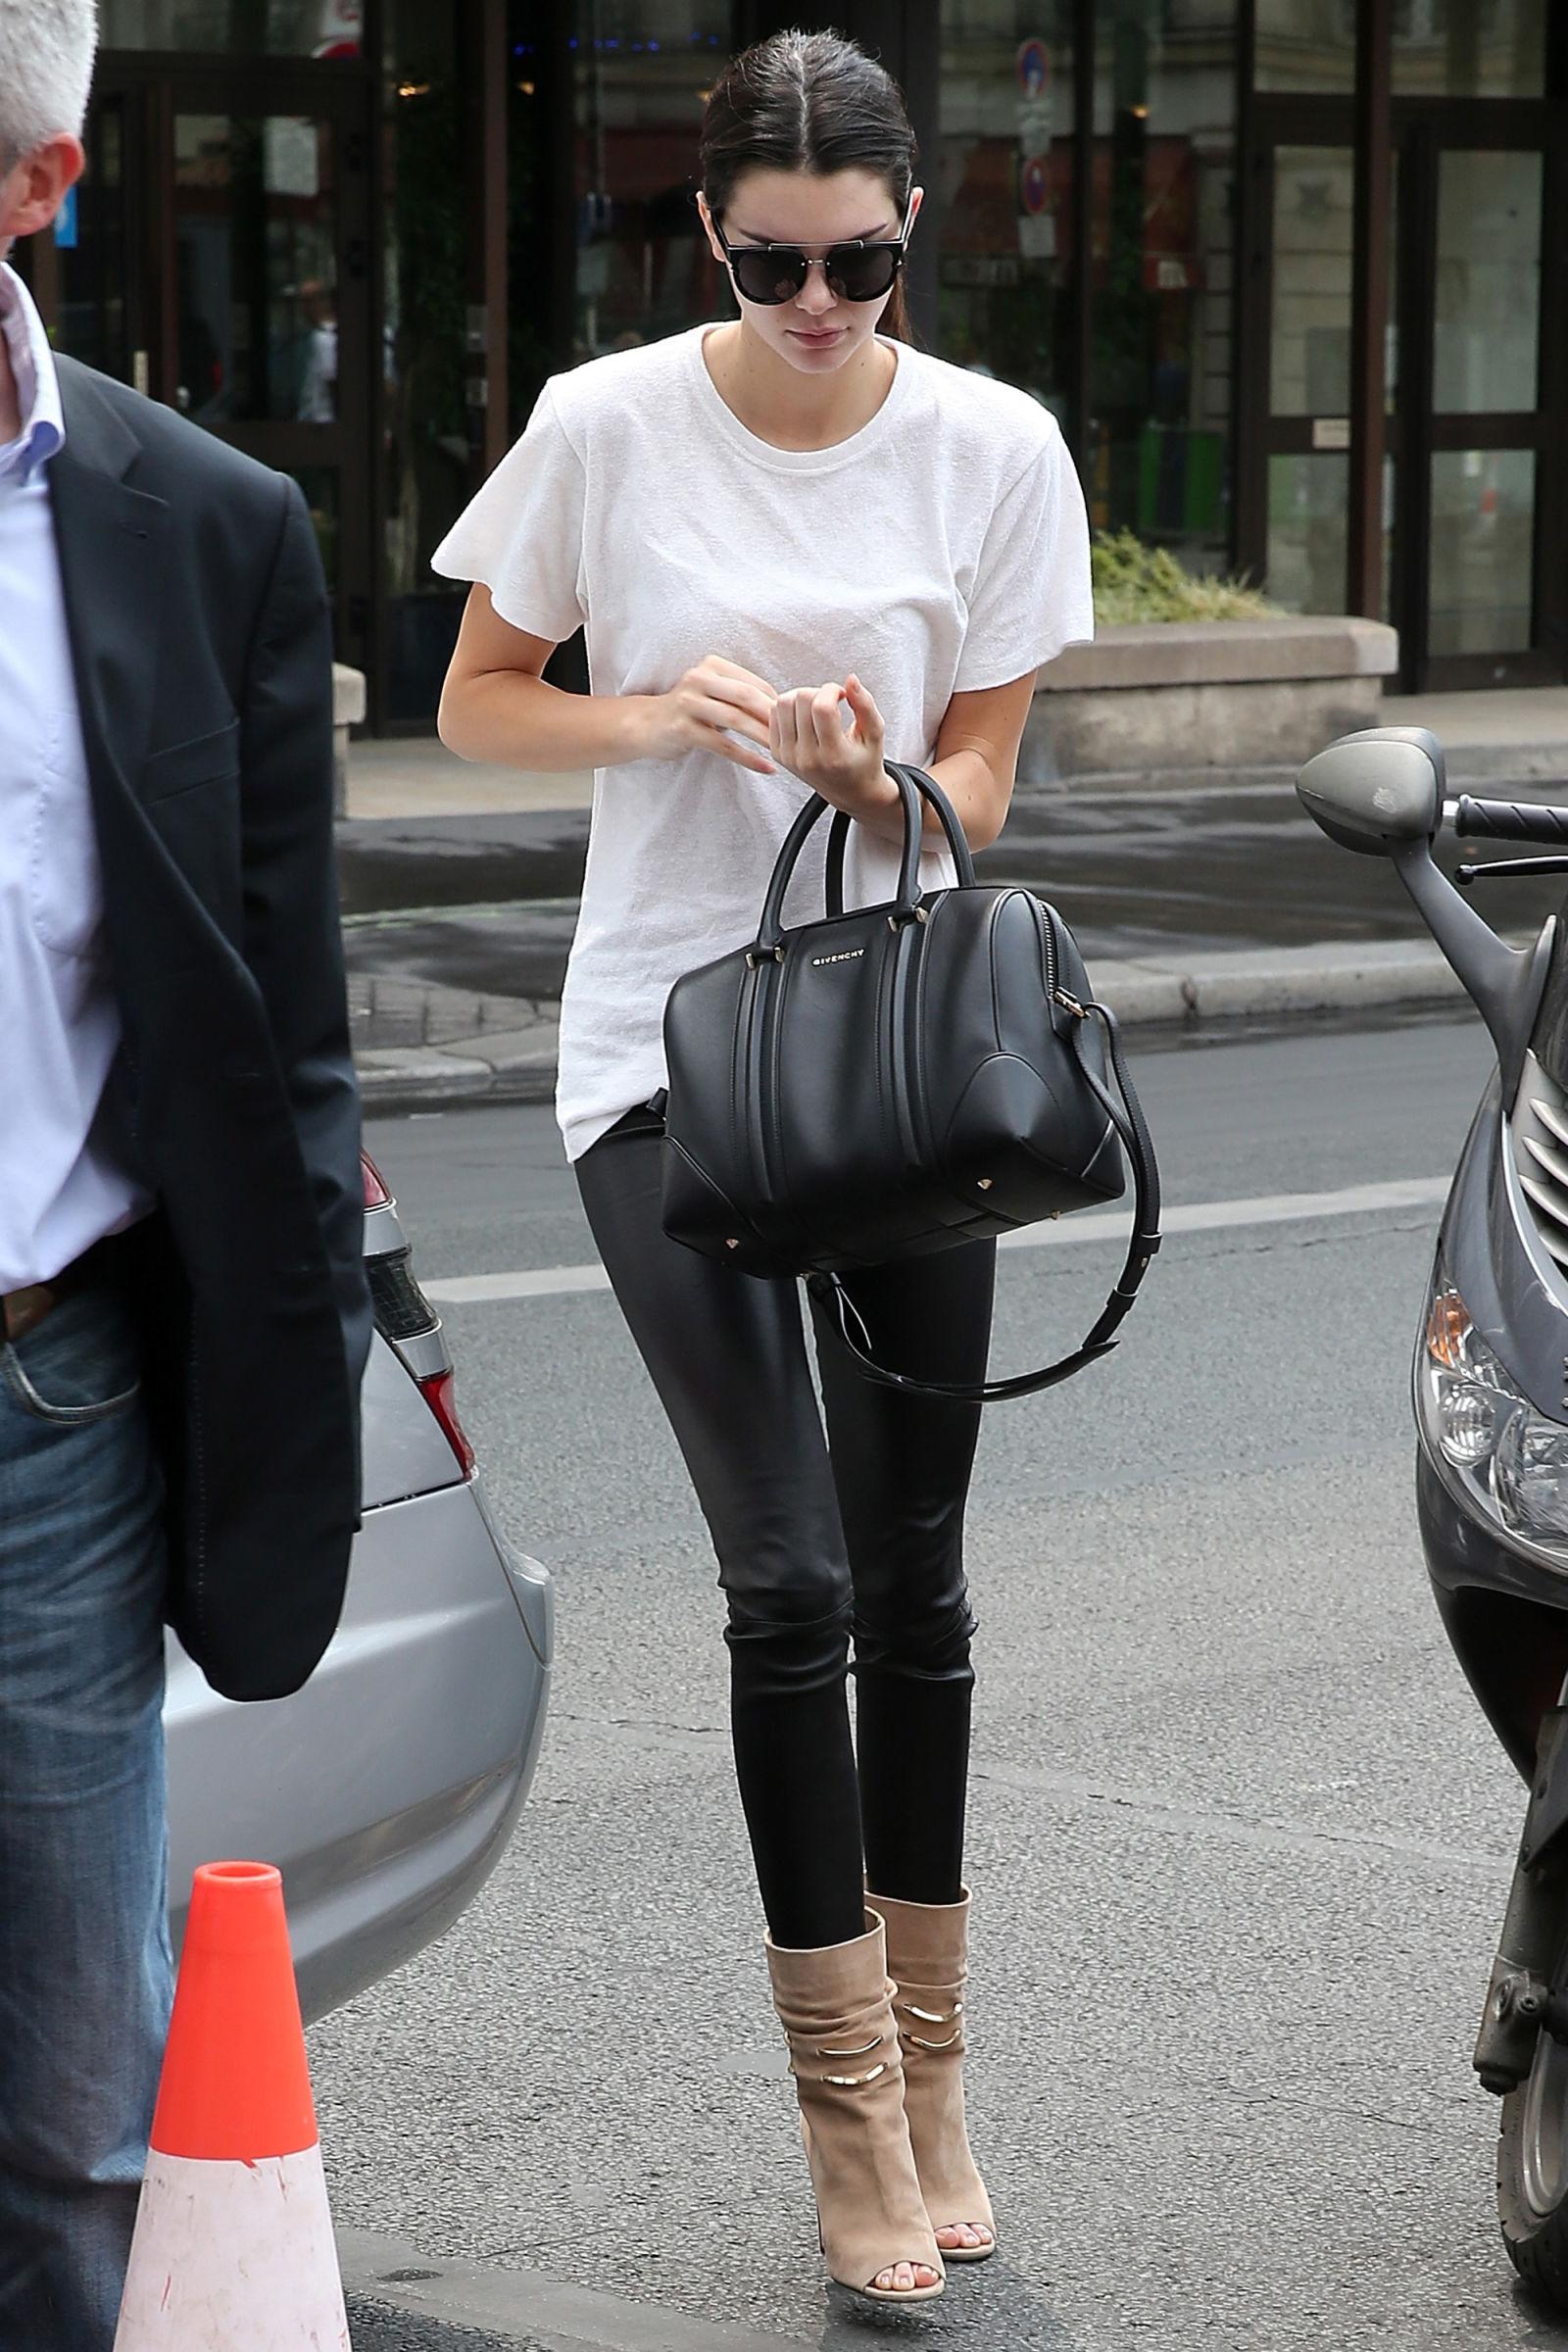 4 Pairs of Popular Leggings Celebrities Love | Who What Wear